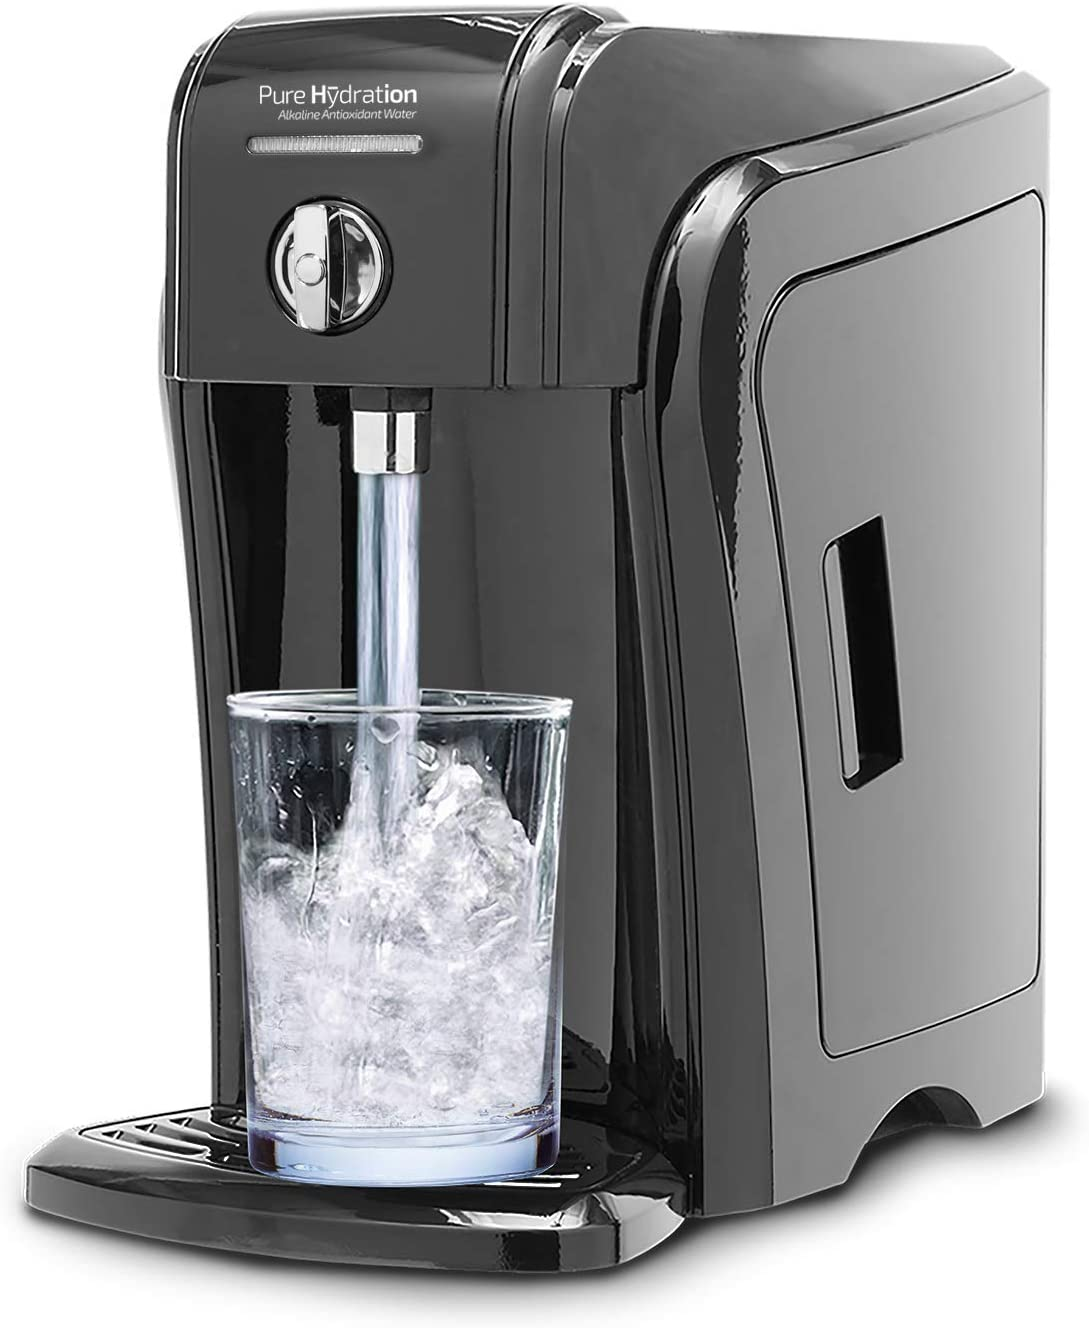 Best Water Ionizer: Pure Hydration Next Generation